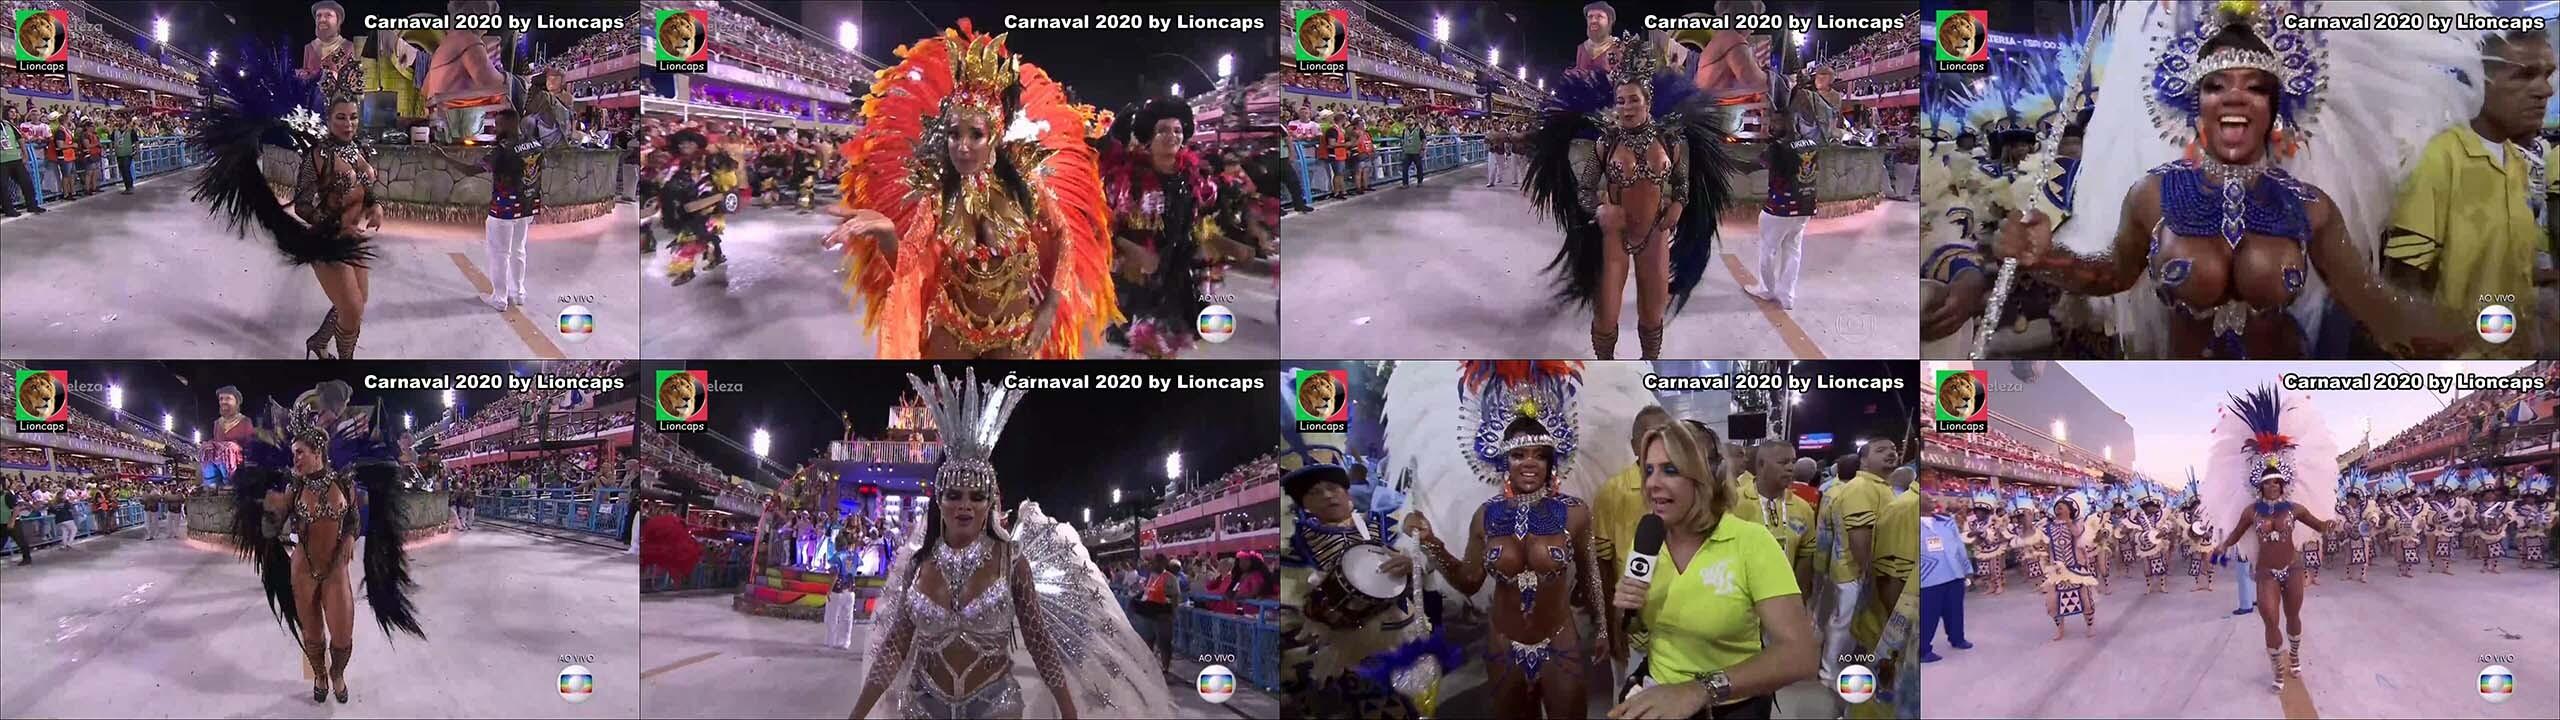 carnaval2020_lioncaps_26_03_2020.jpg